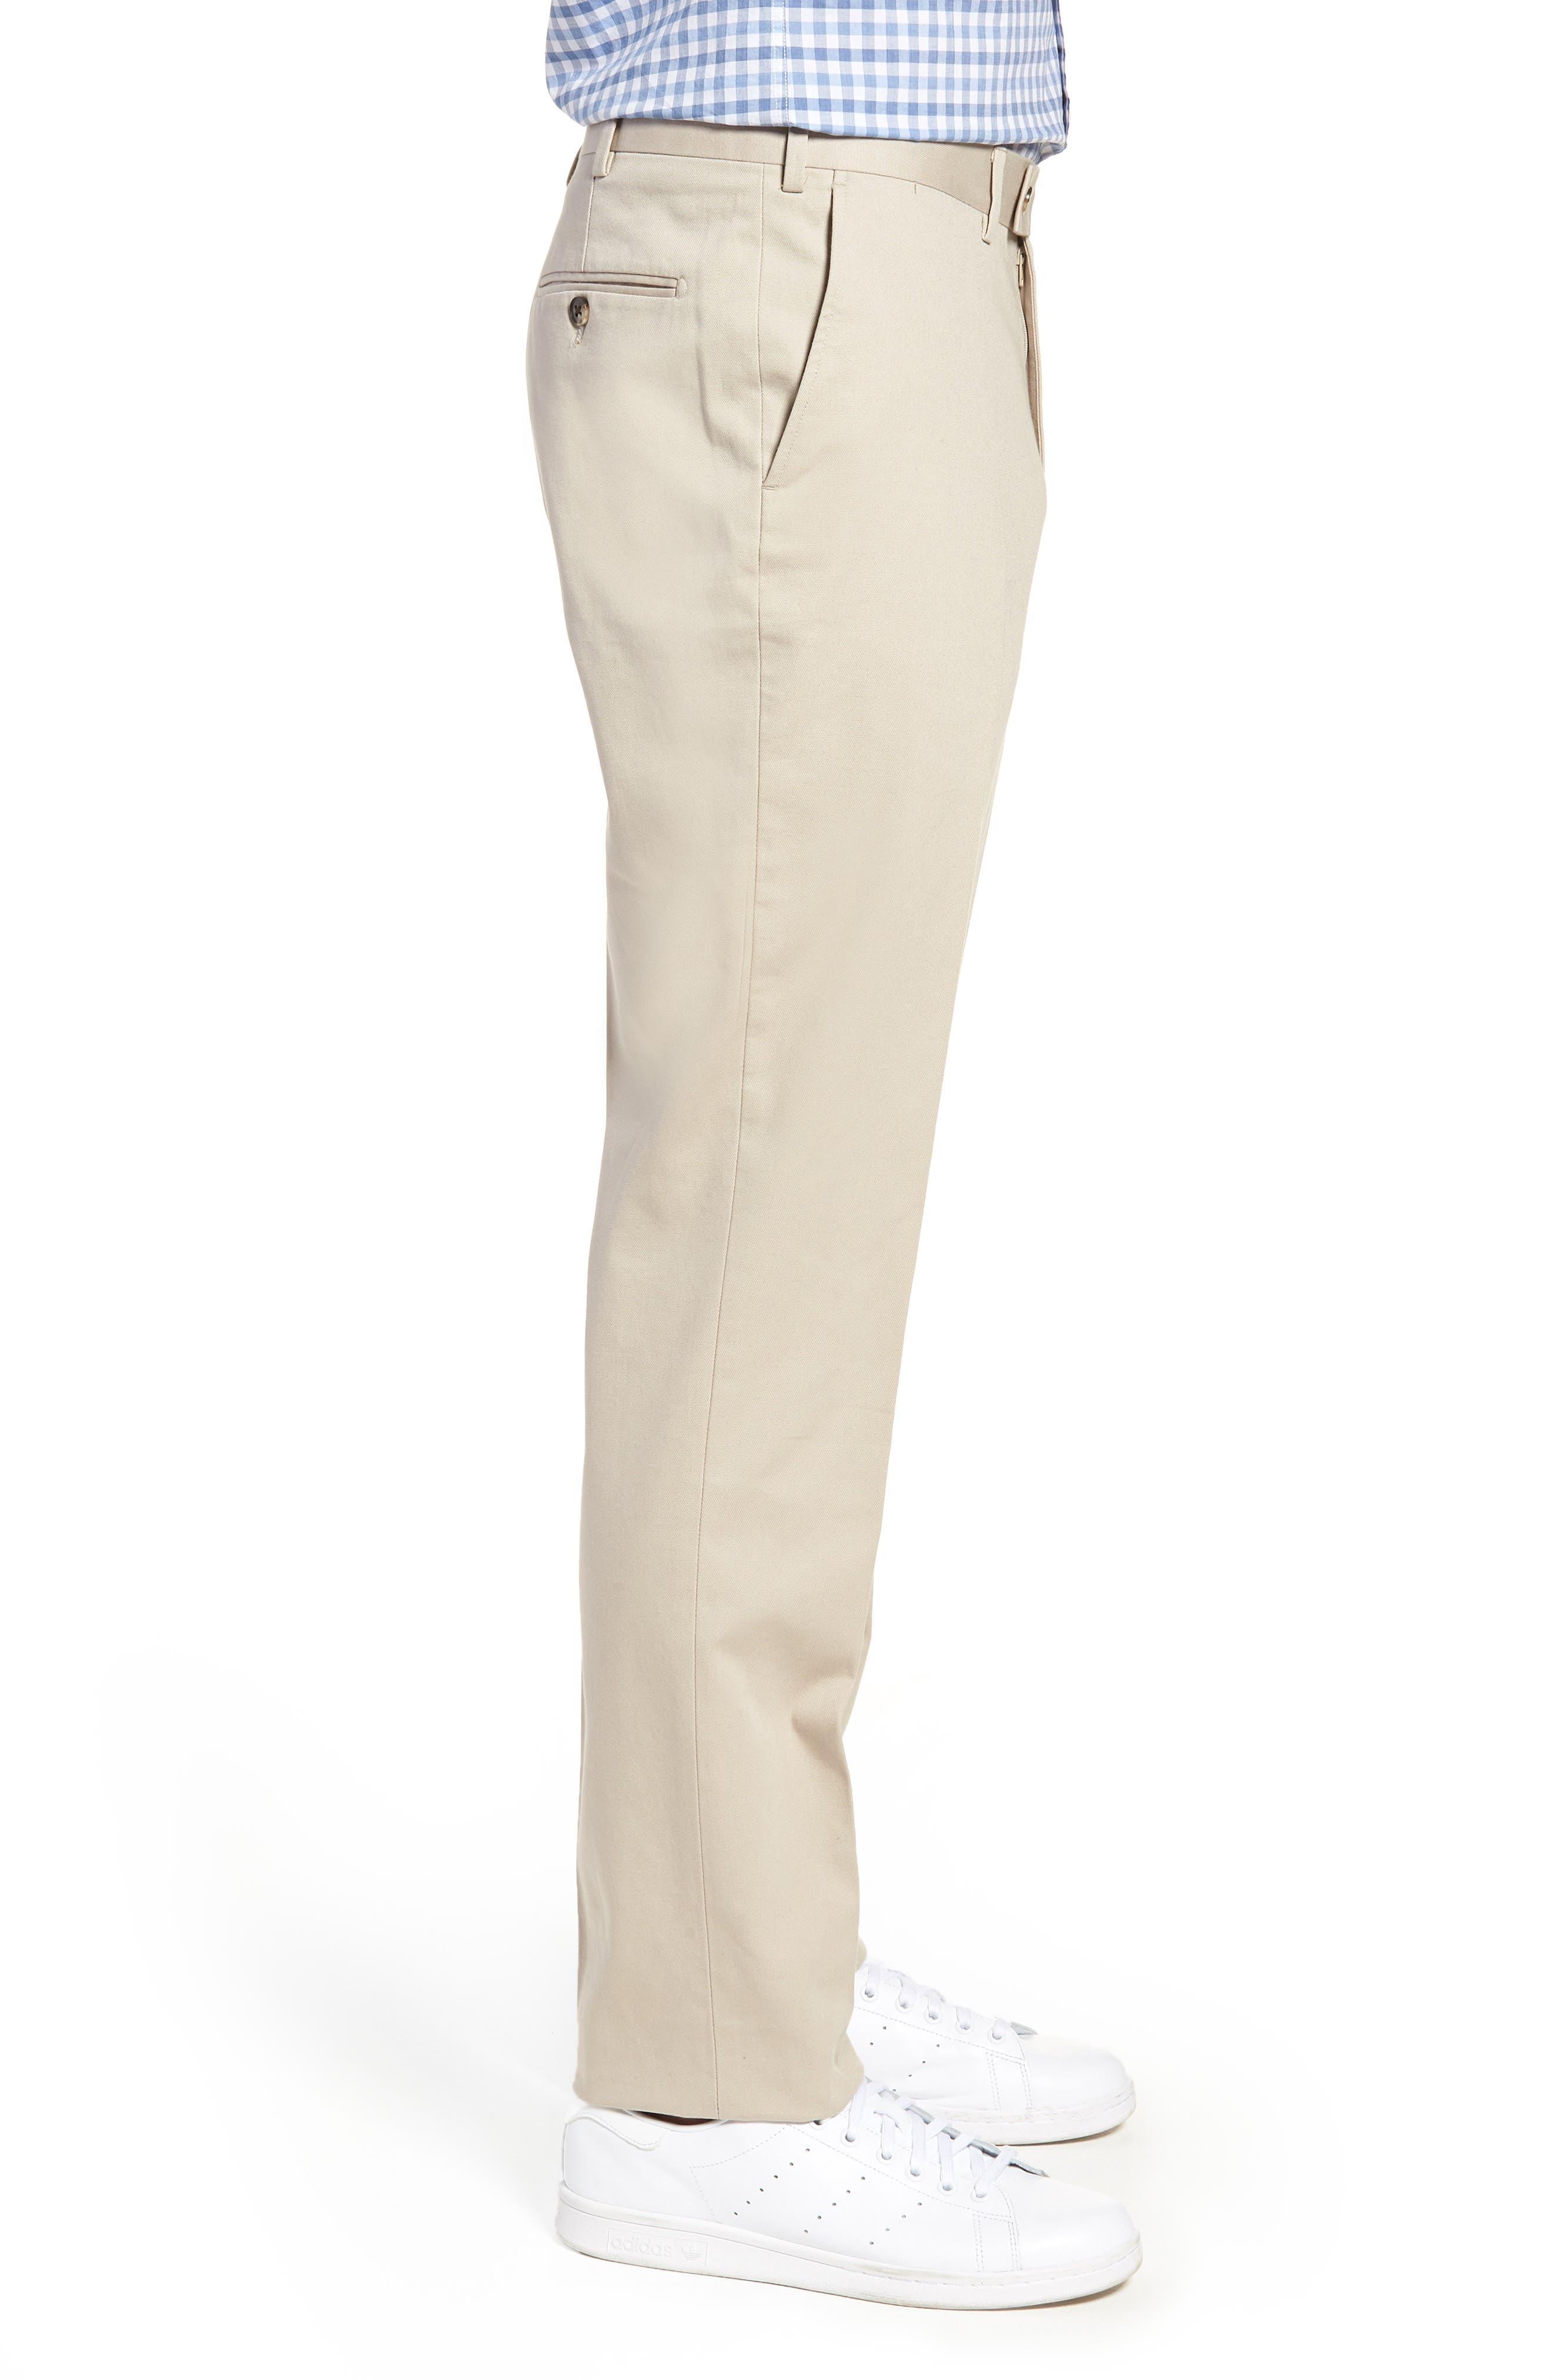 Finchley Regular Fit Pants,                             Alternate thumbnail 3, color,                             102